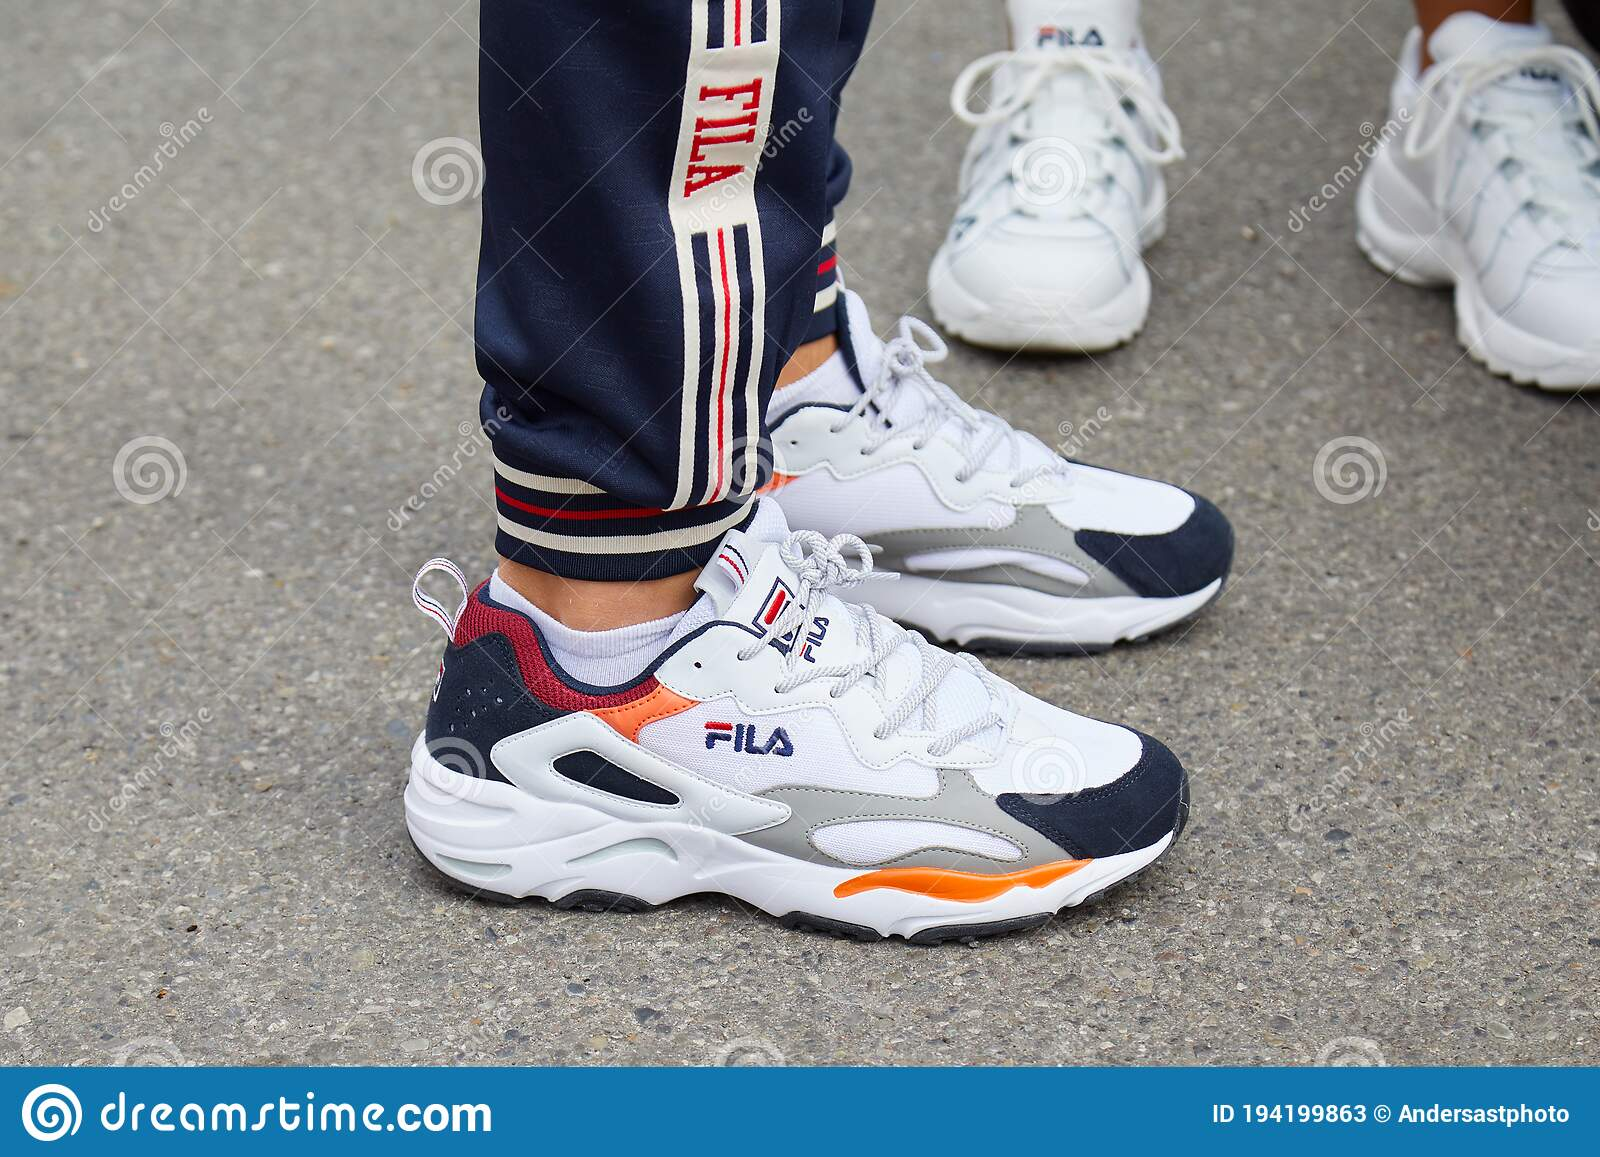 fila fashion sneakers